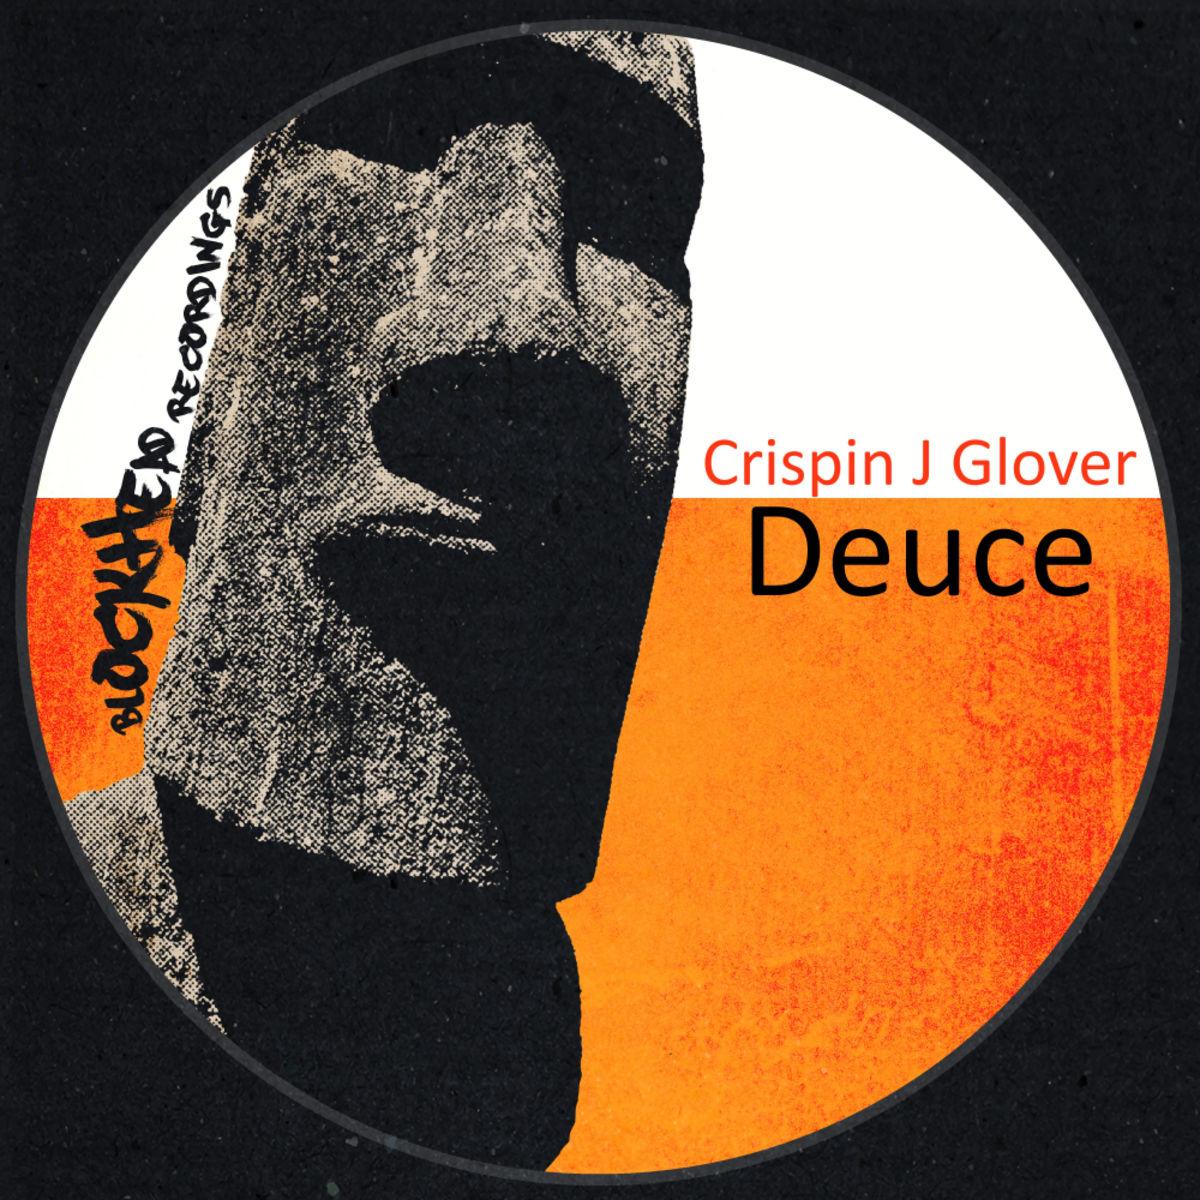 Crispin J Glover - Deuce (Original Mix)